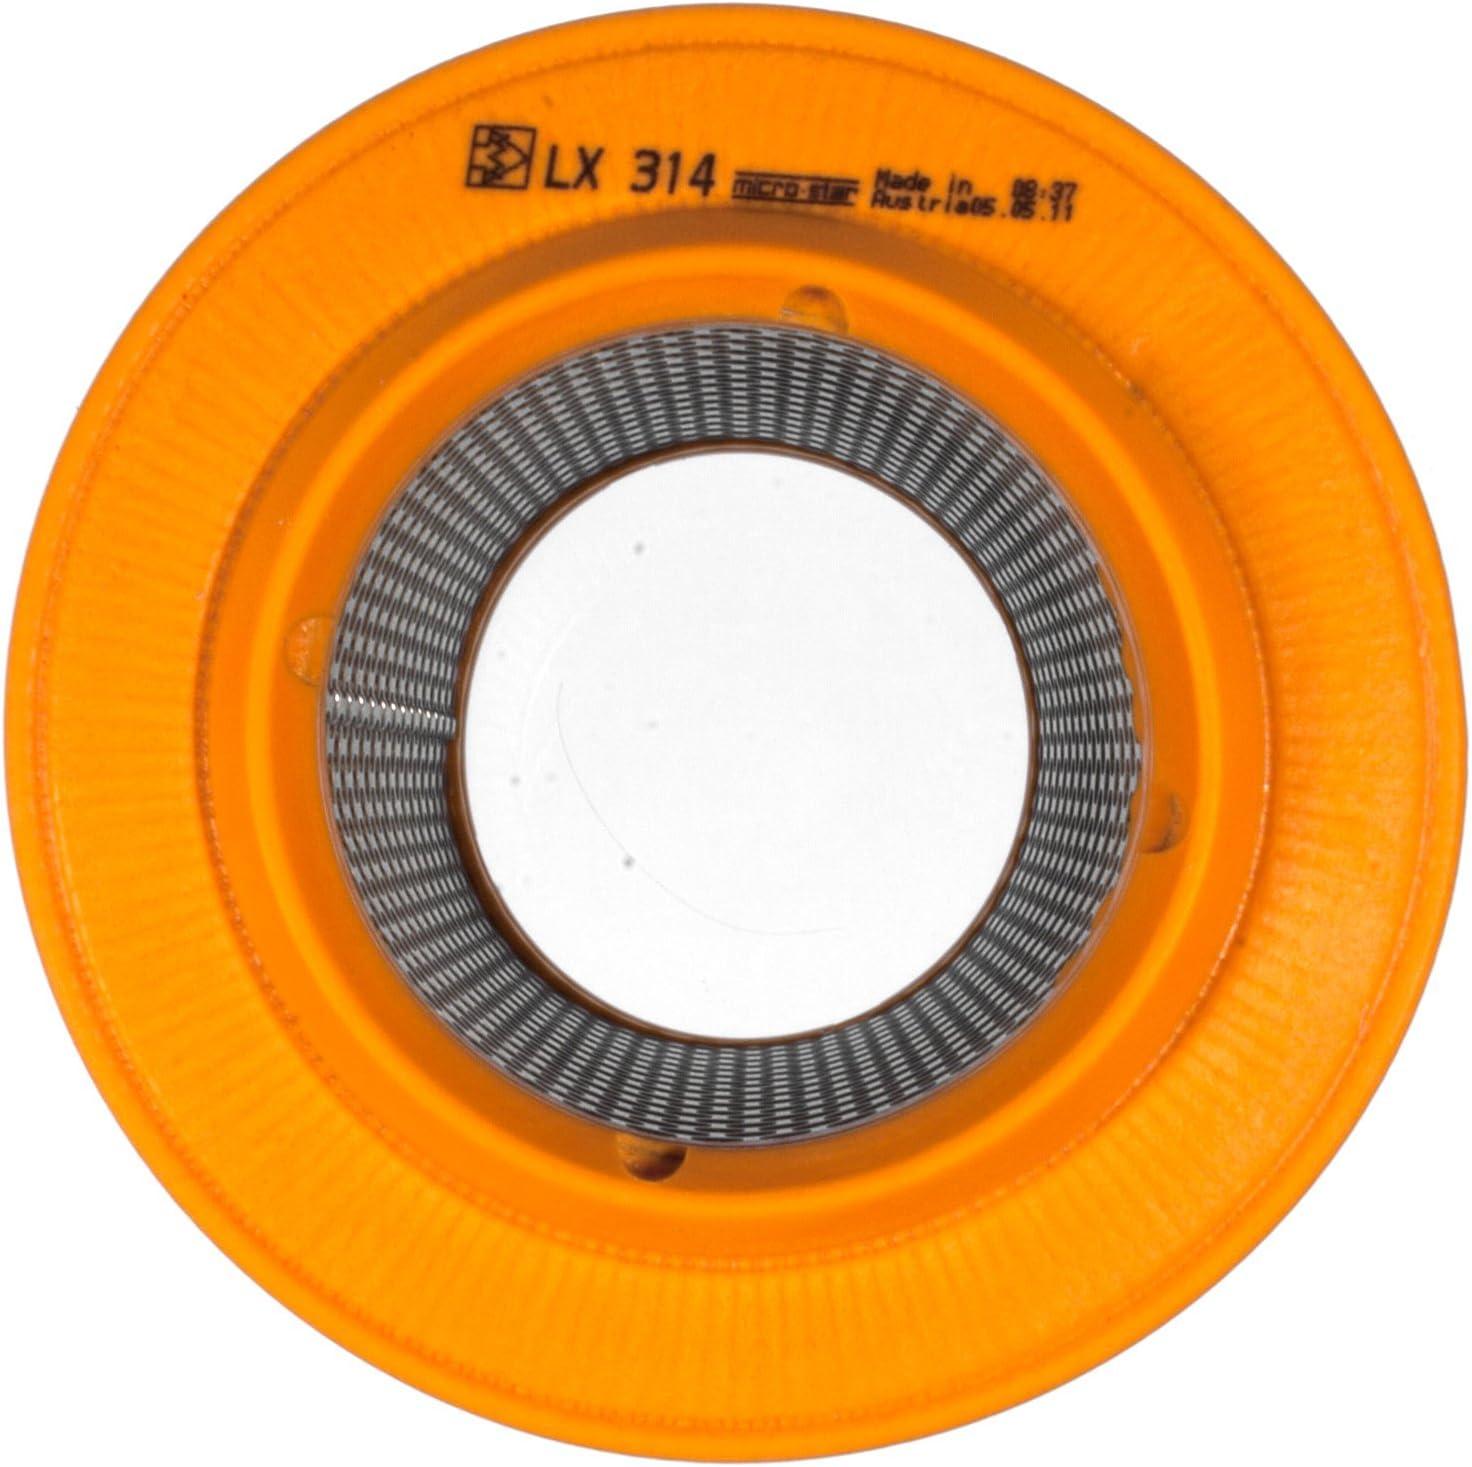 MAHLE Original LX 314 Air Filter